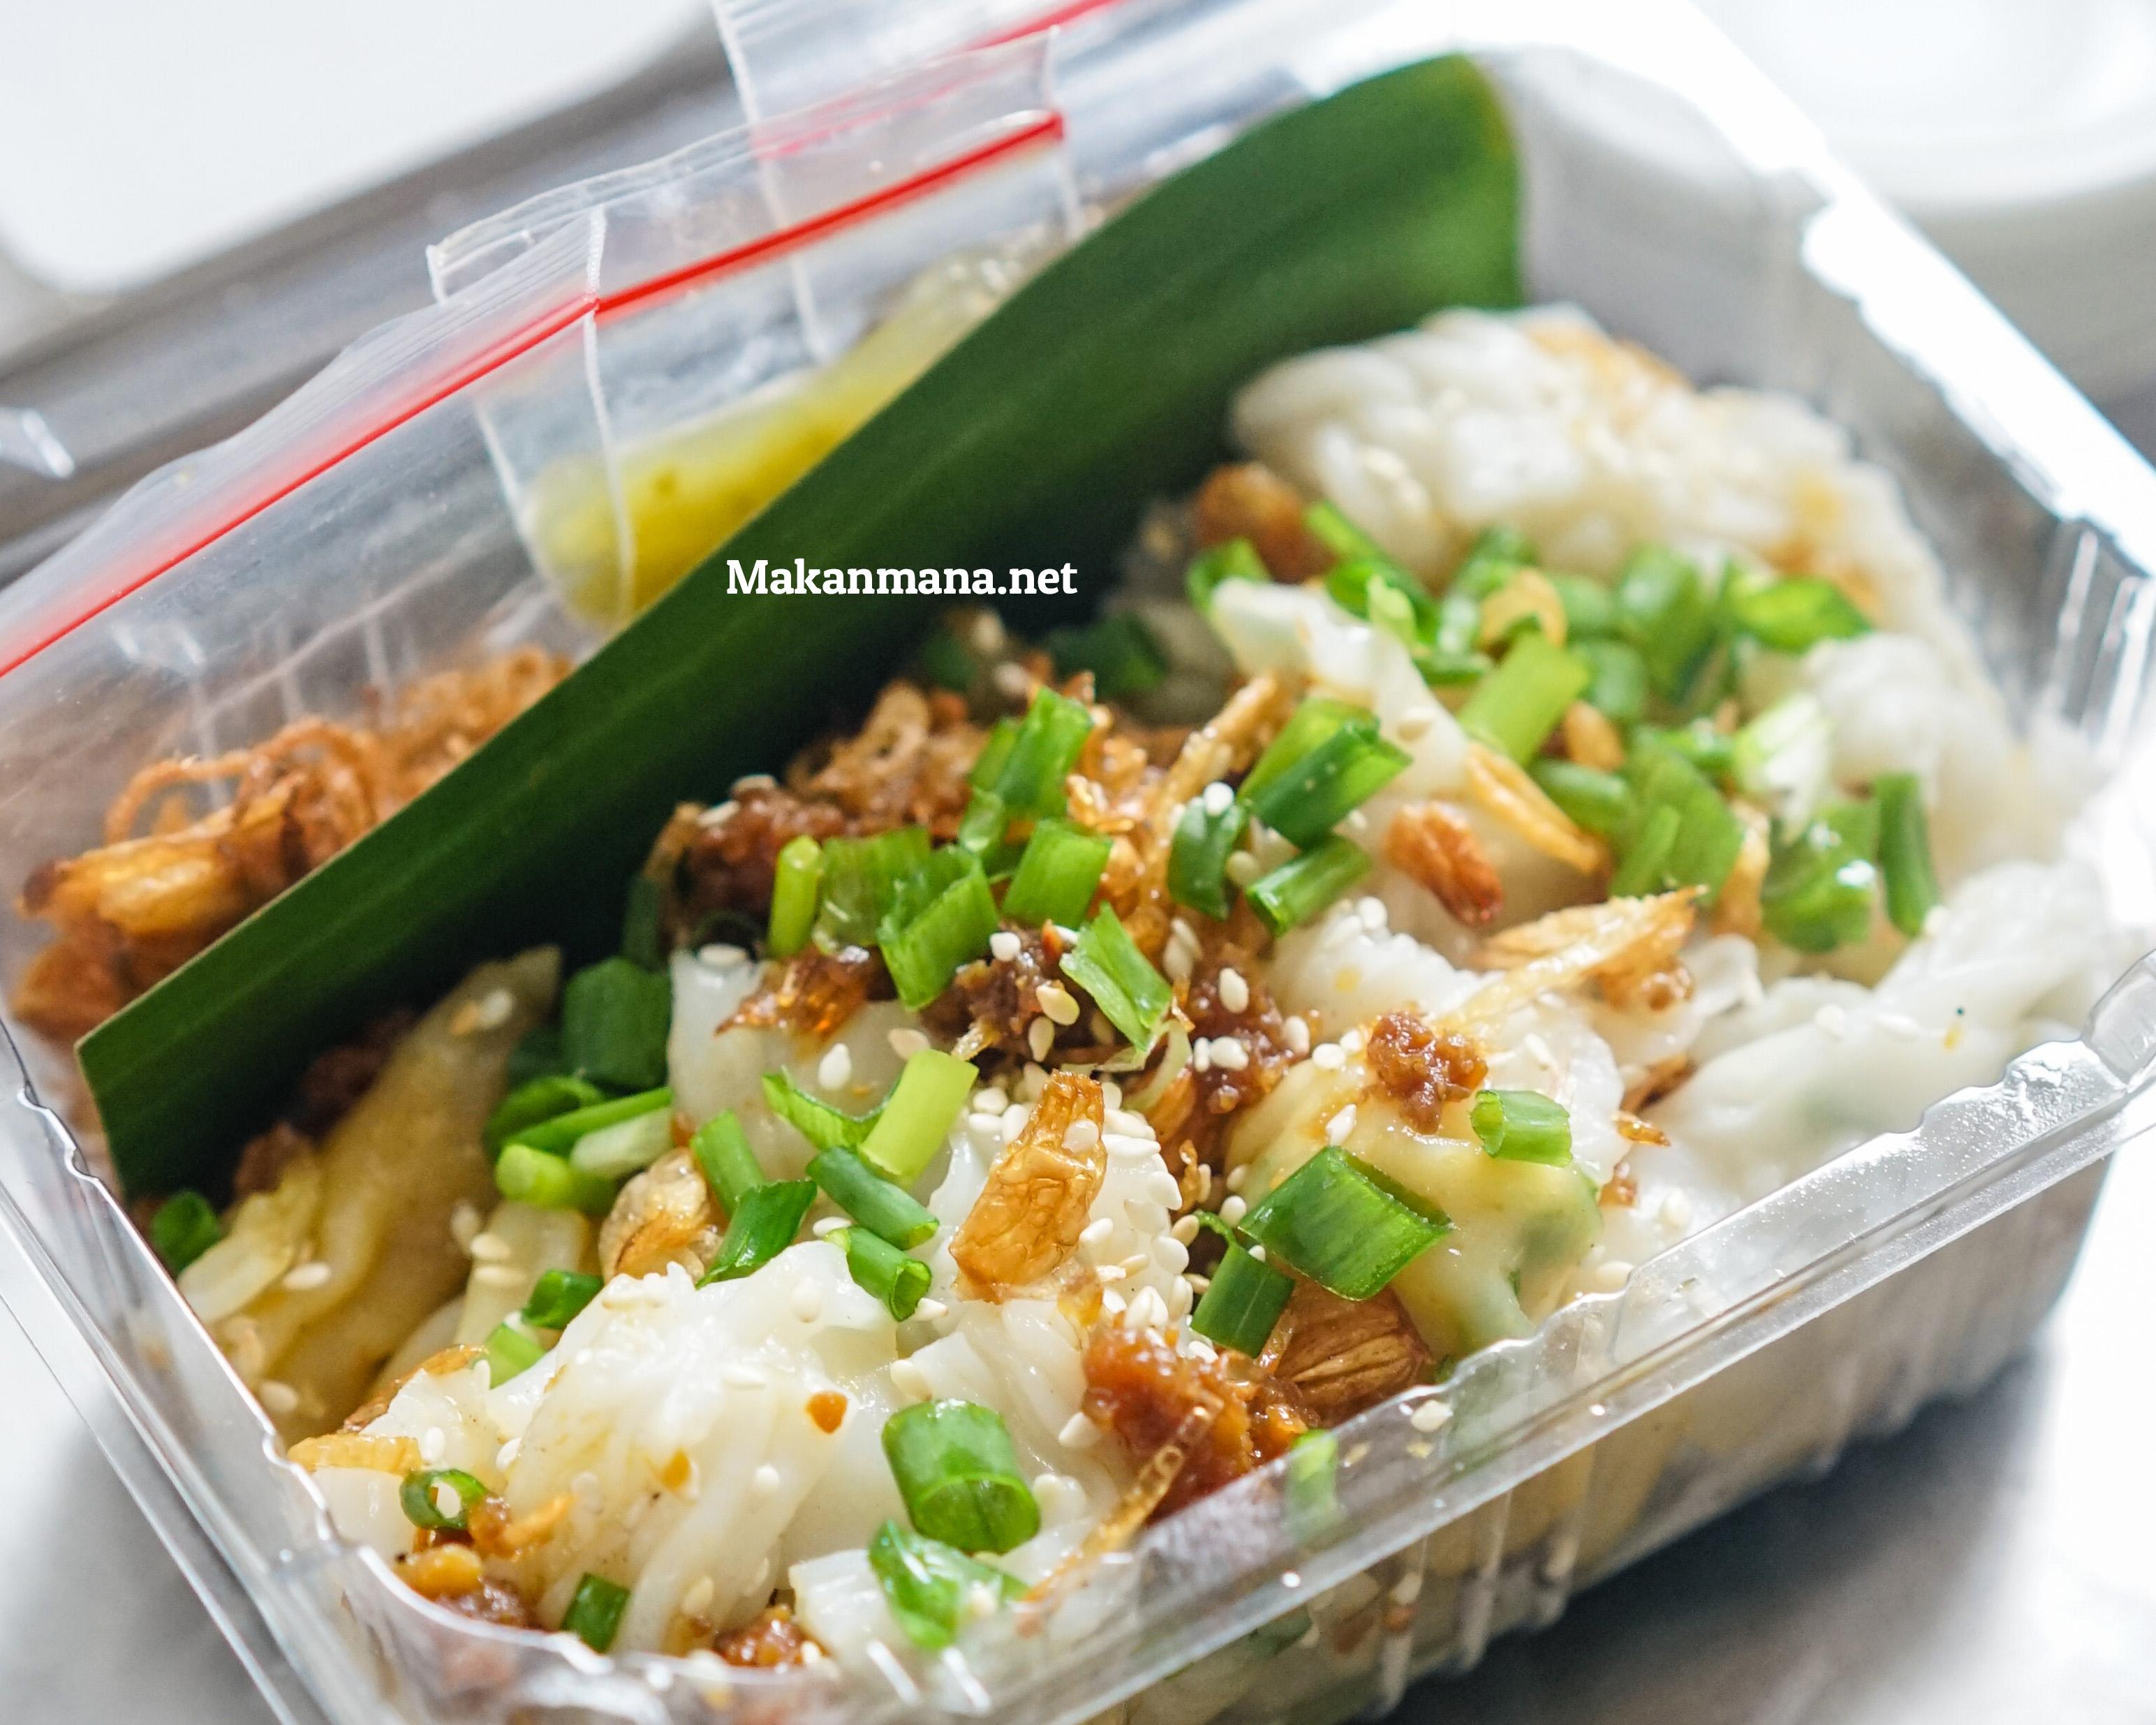 5 Outlet Cheong Fun Paten, Medan Punya!